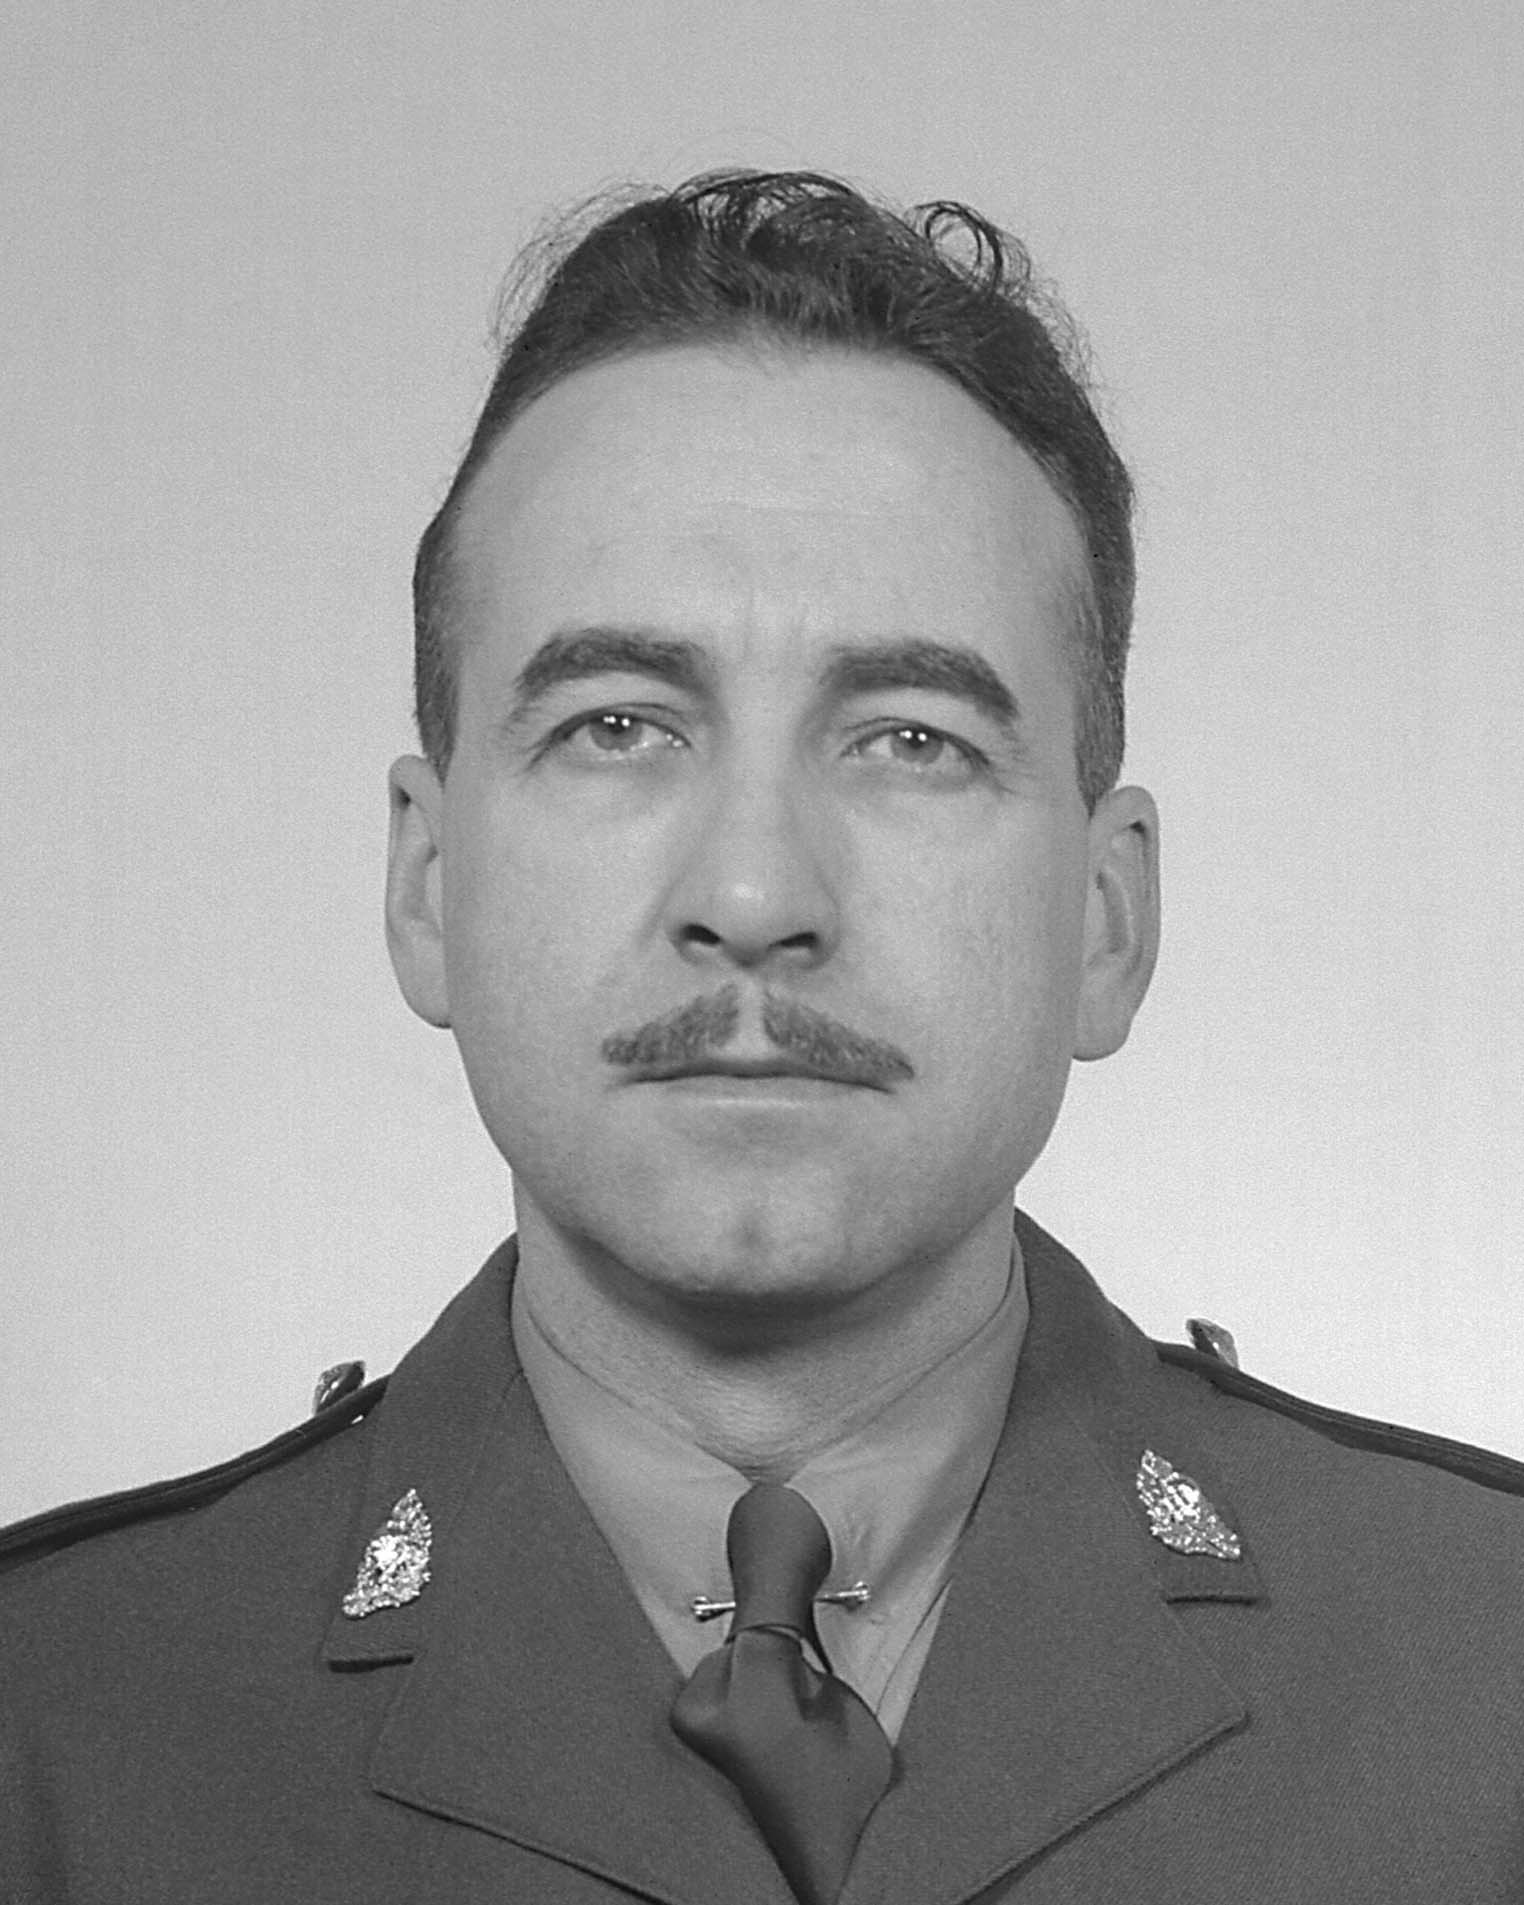 Inspector David James McCombe